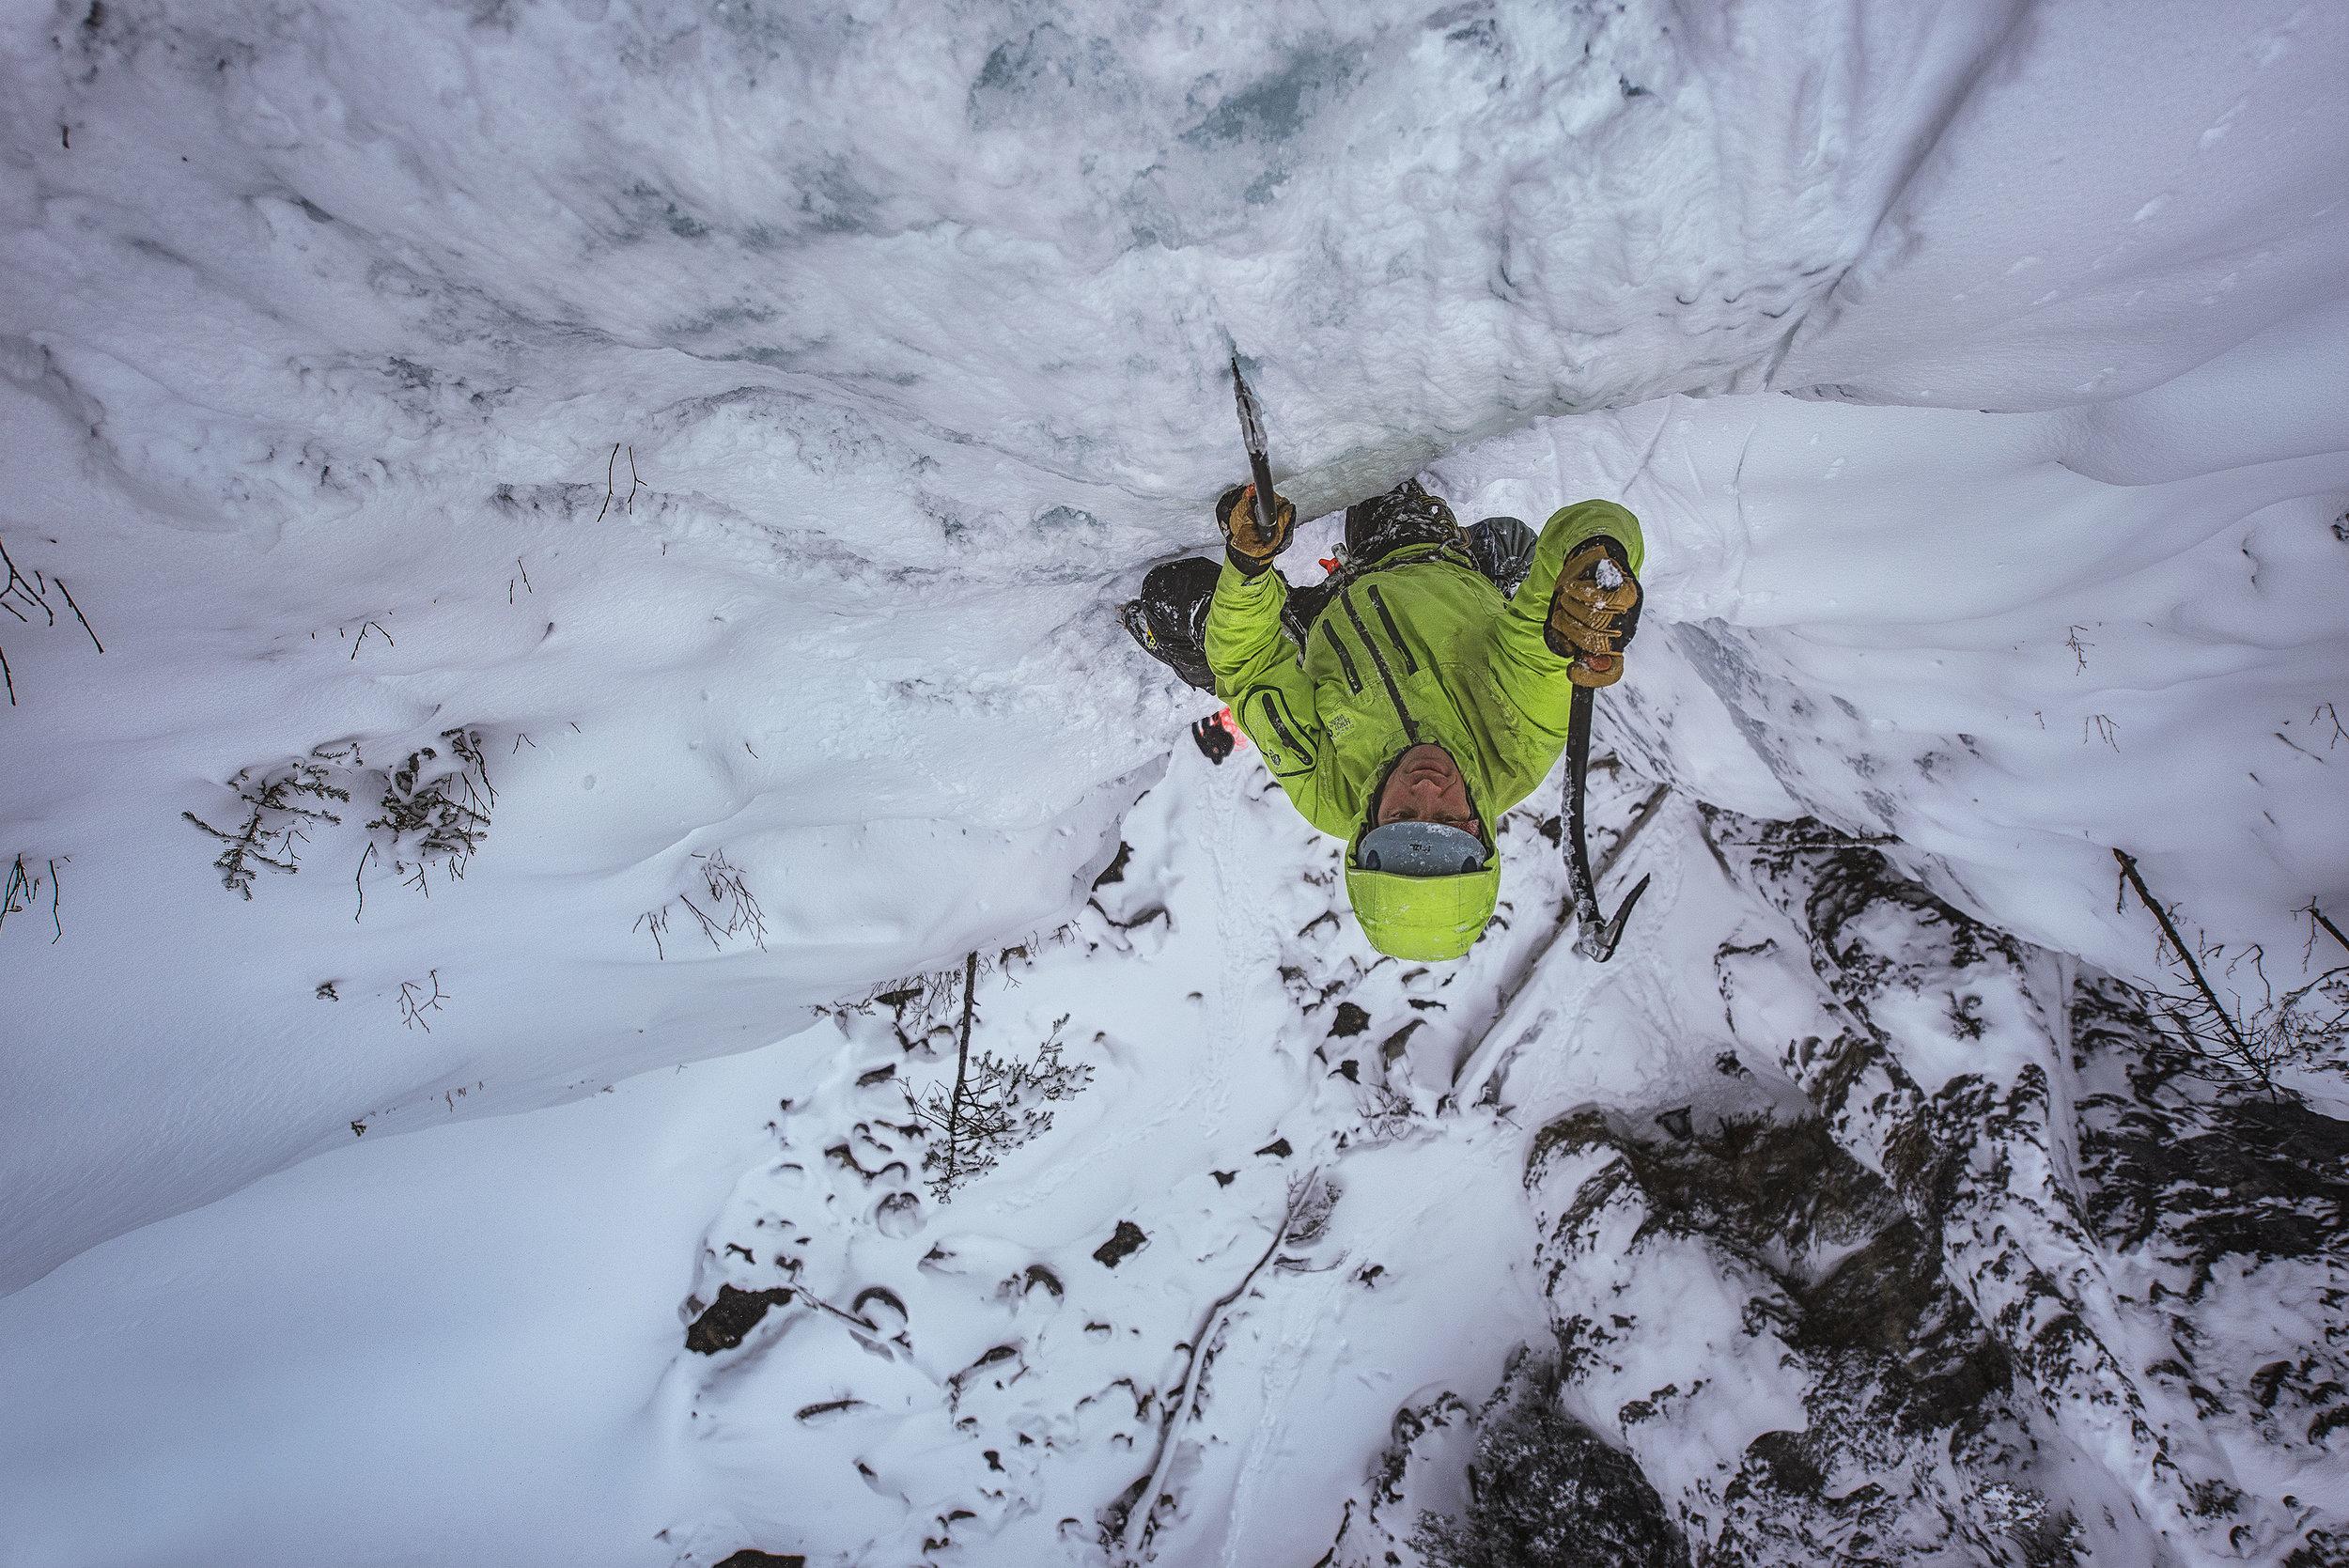 austin-trigg-ice-climbing-banff-lead-climb-King-Creek.jpg